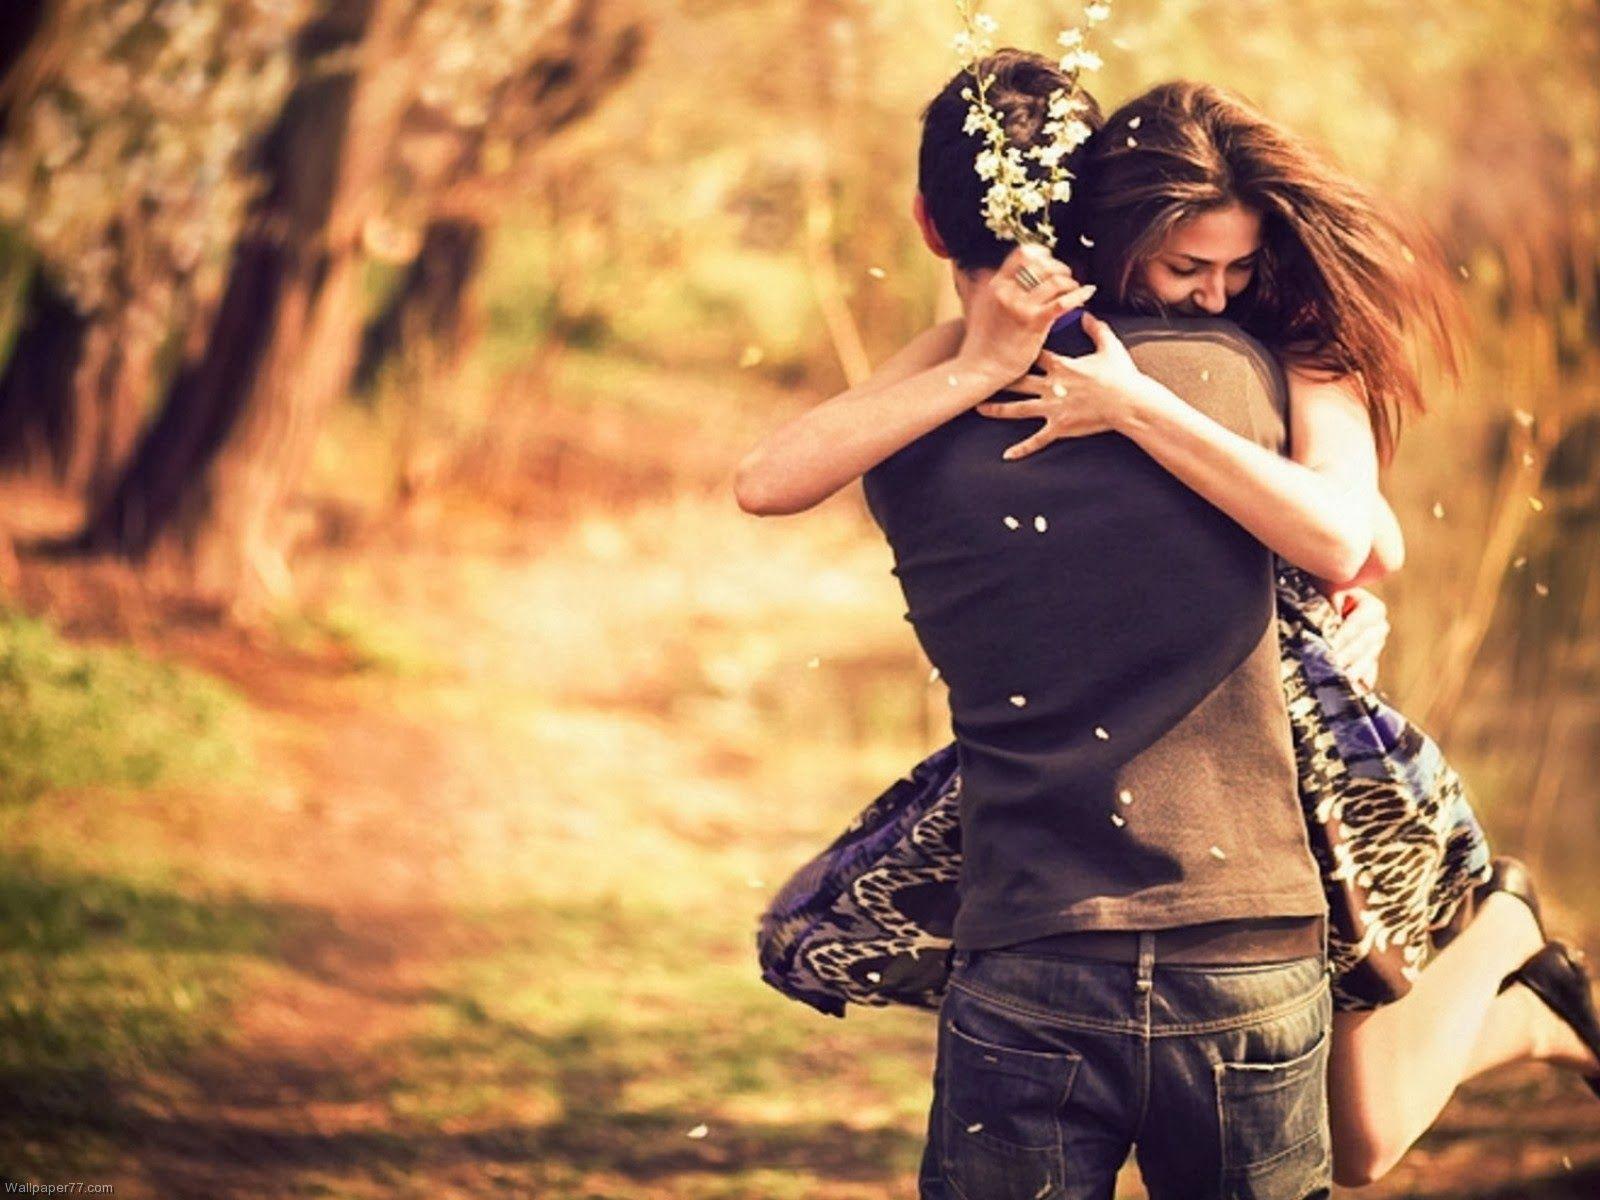 Hd wallpaper romantic - Romantic Love Hd Wallpapers Get Free Top Quality Romantic Love Hd Wallpapers For Your Desktop